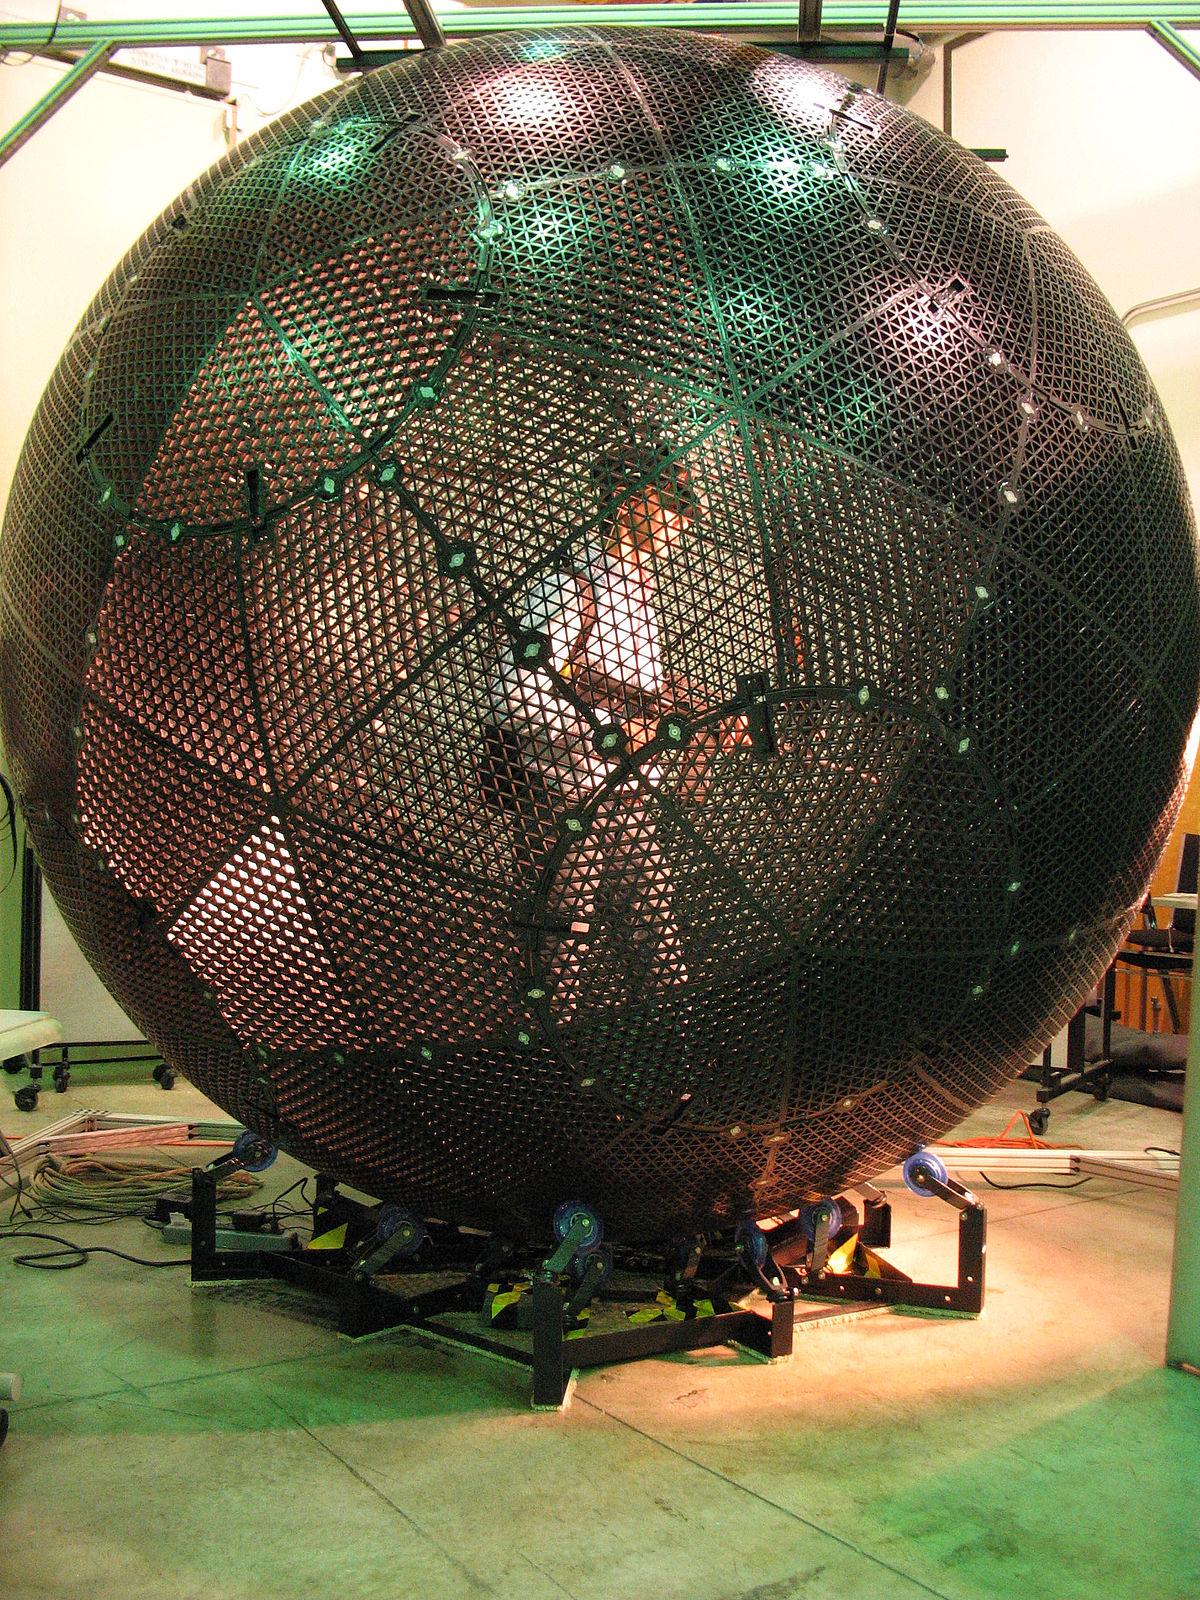 VirtuSphere - Wikipedia